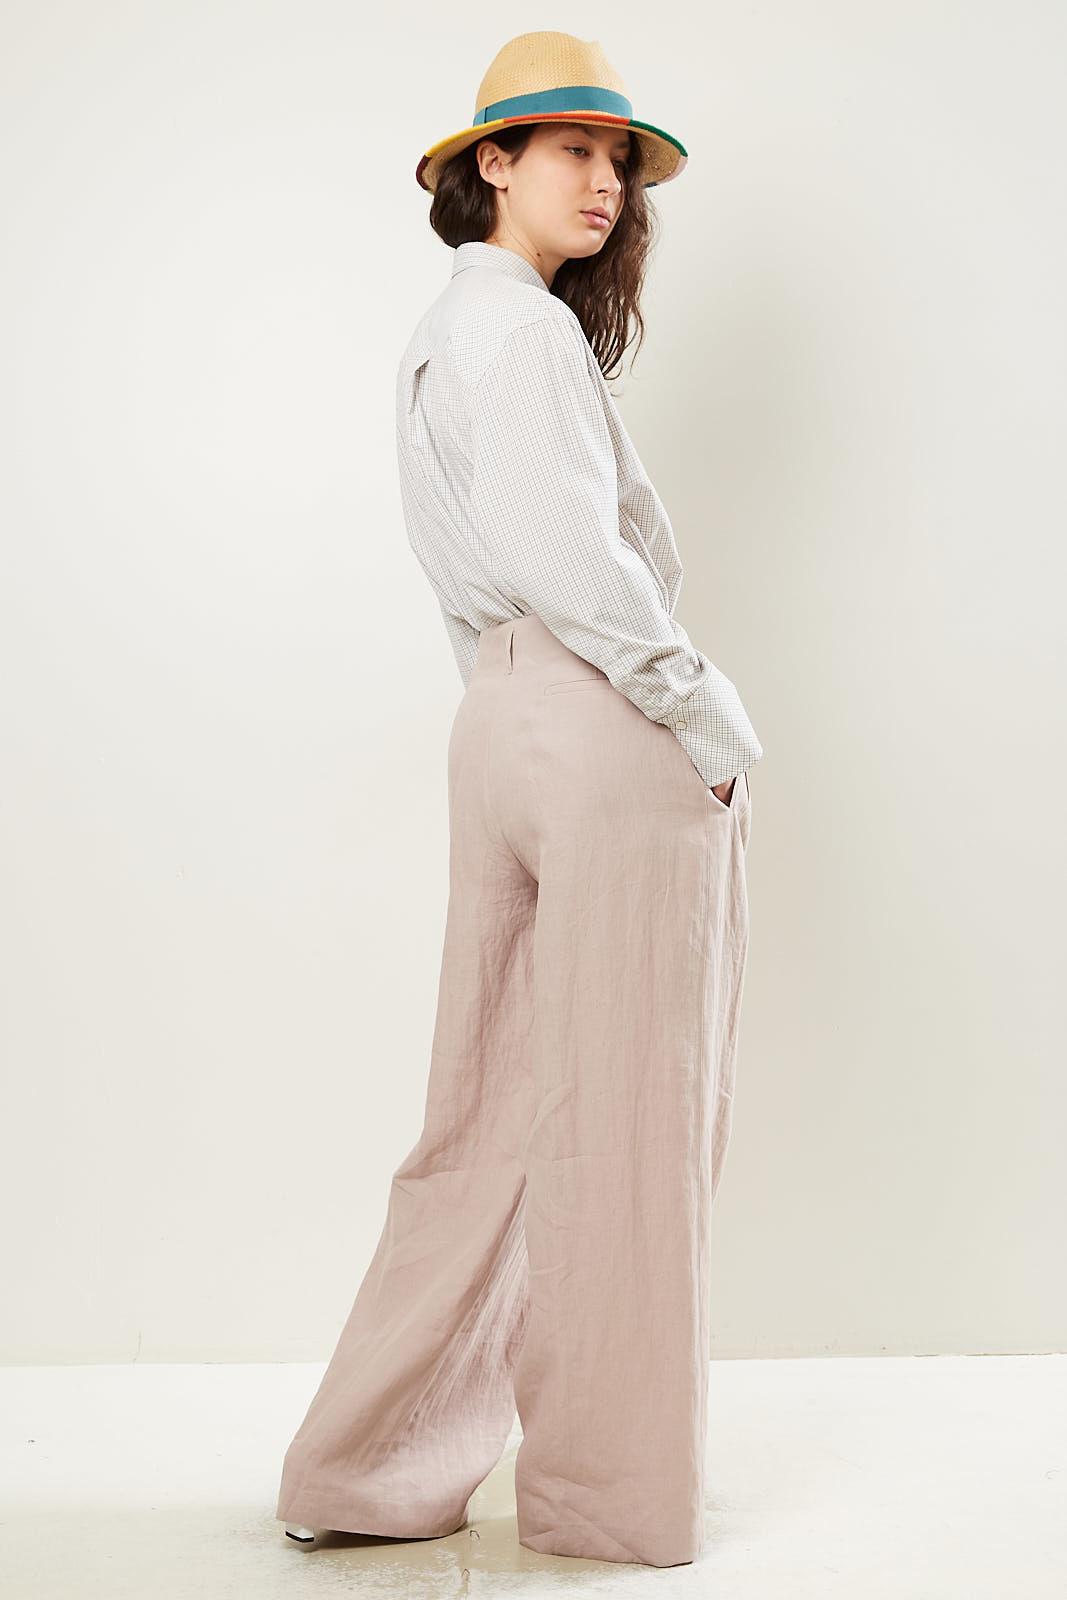 Paul Smith - womens pants